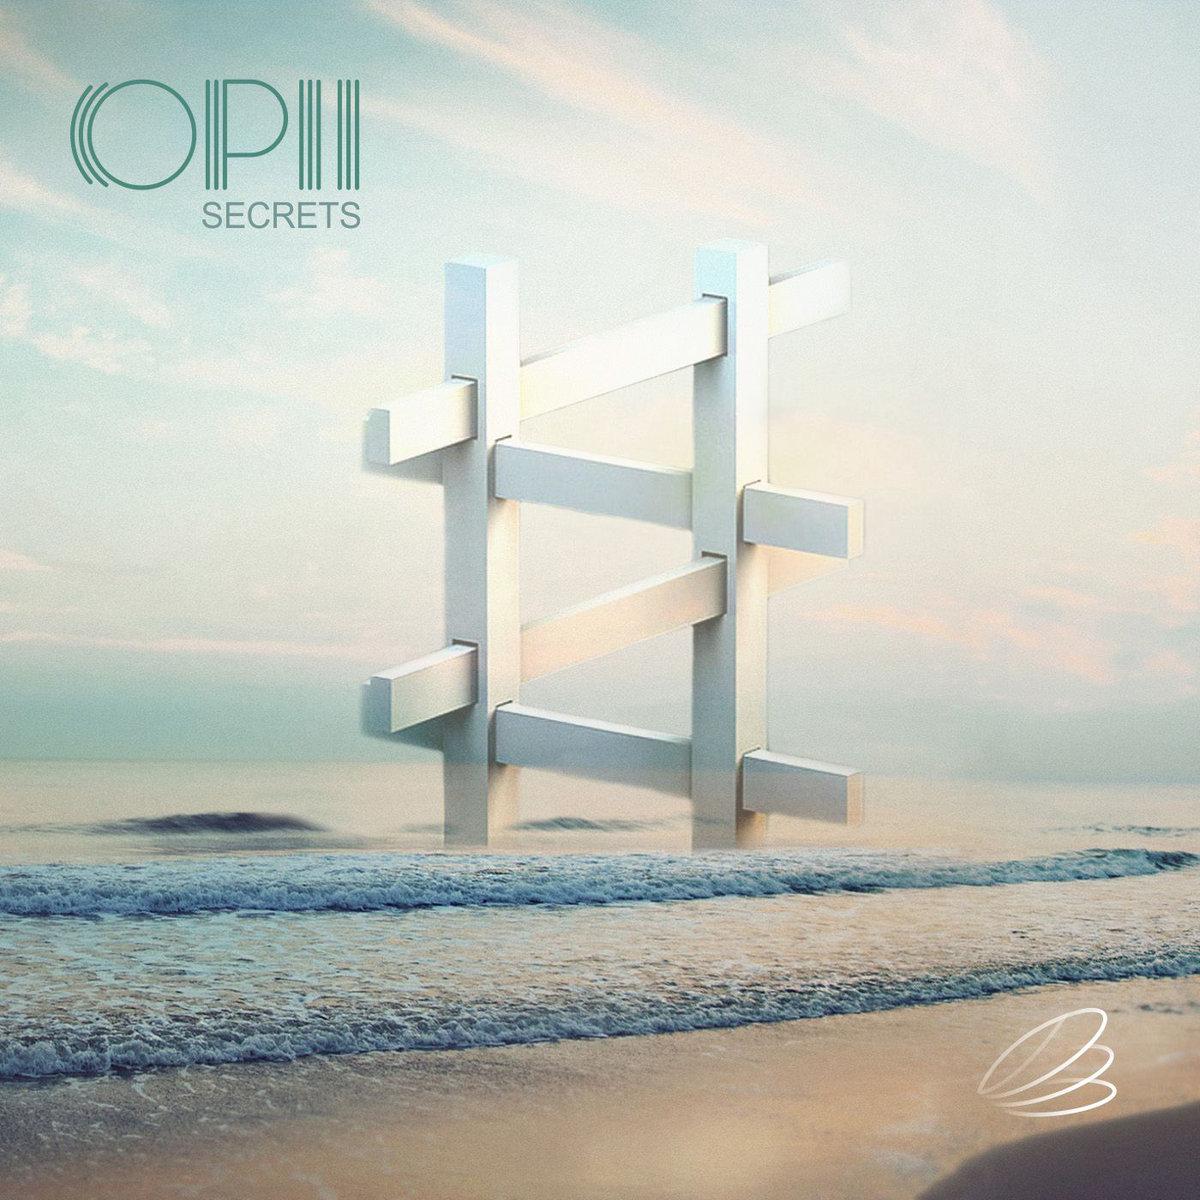 Opii - Secrets